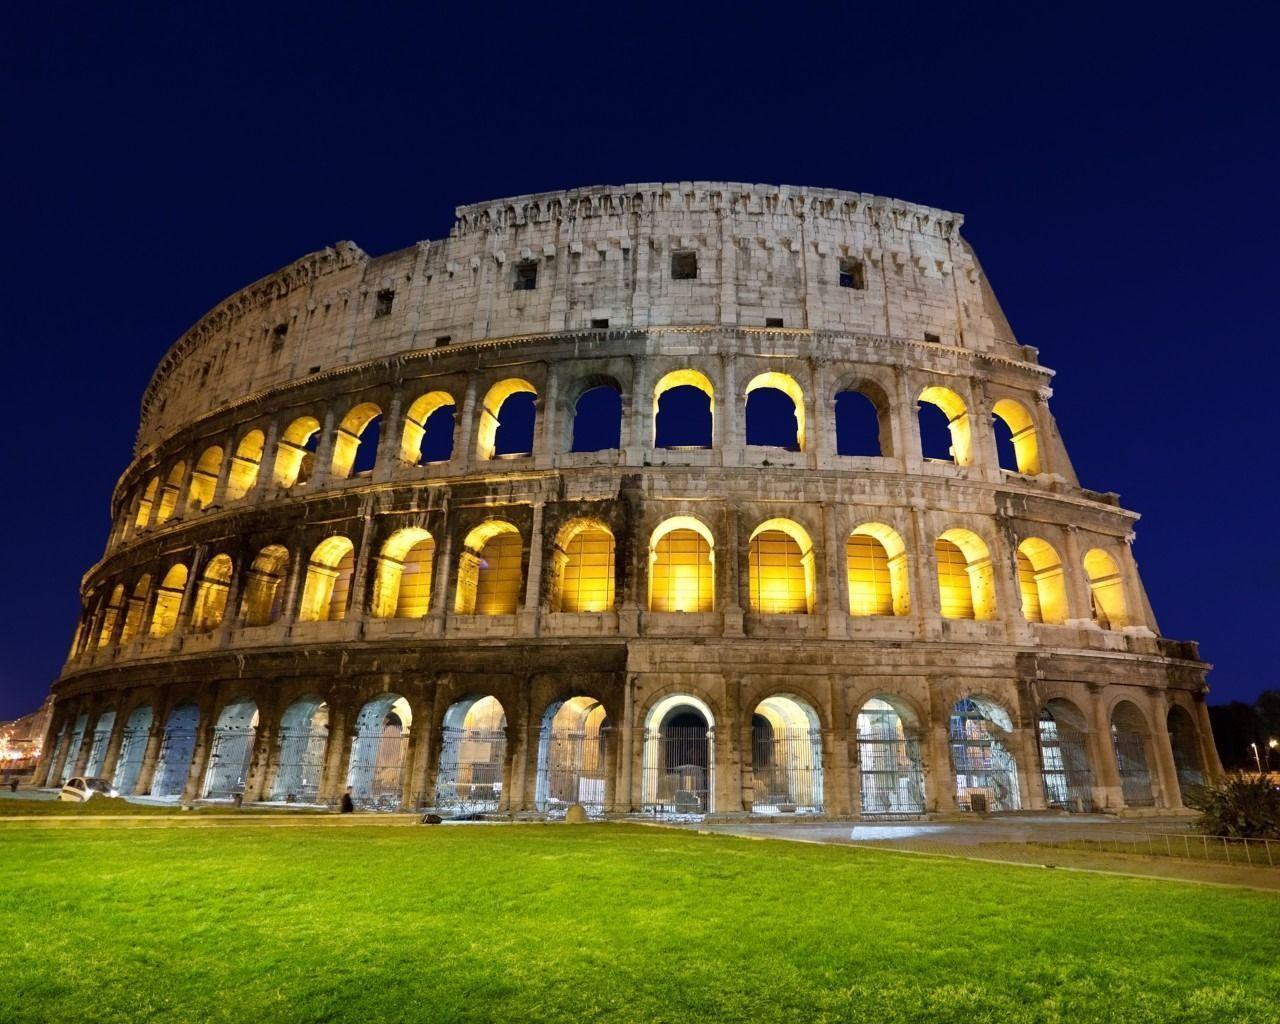 Colosseum Roma Wallpaper | Wallpaper HD | HD Desktop Backgrounds ...